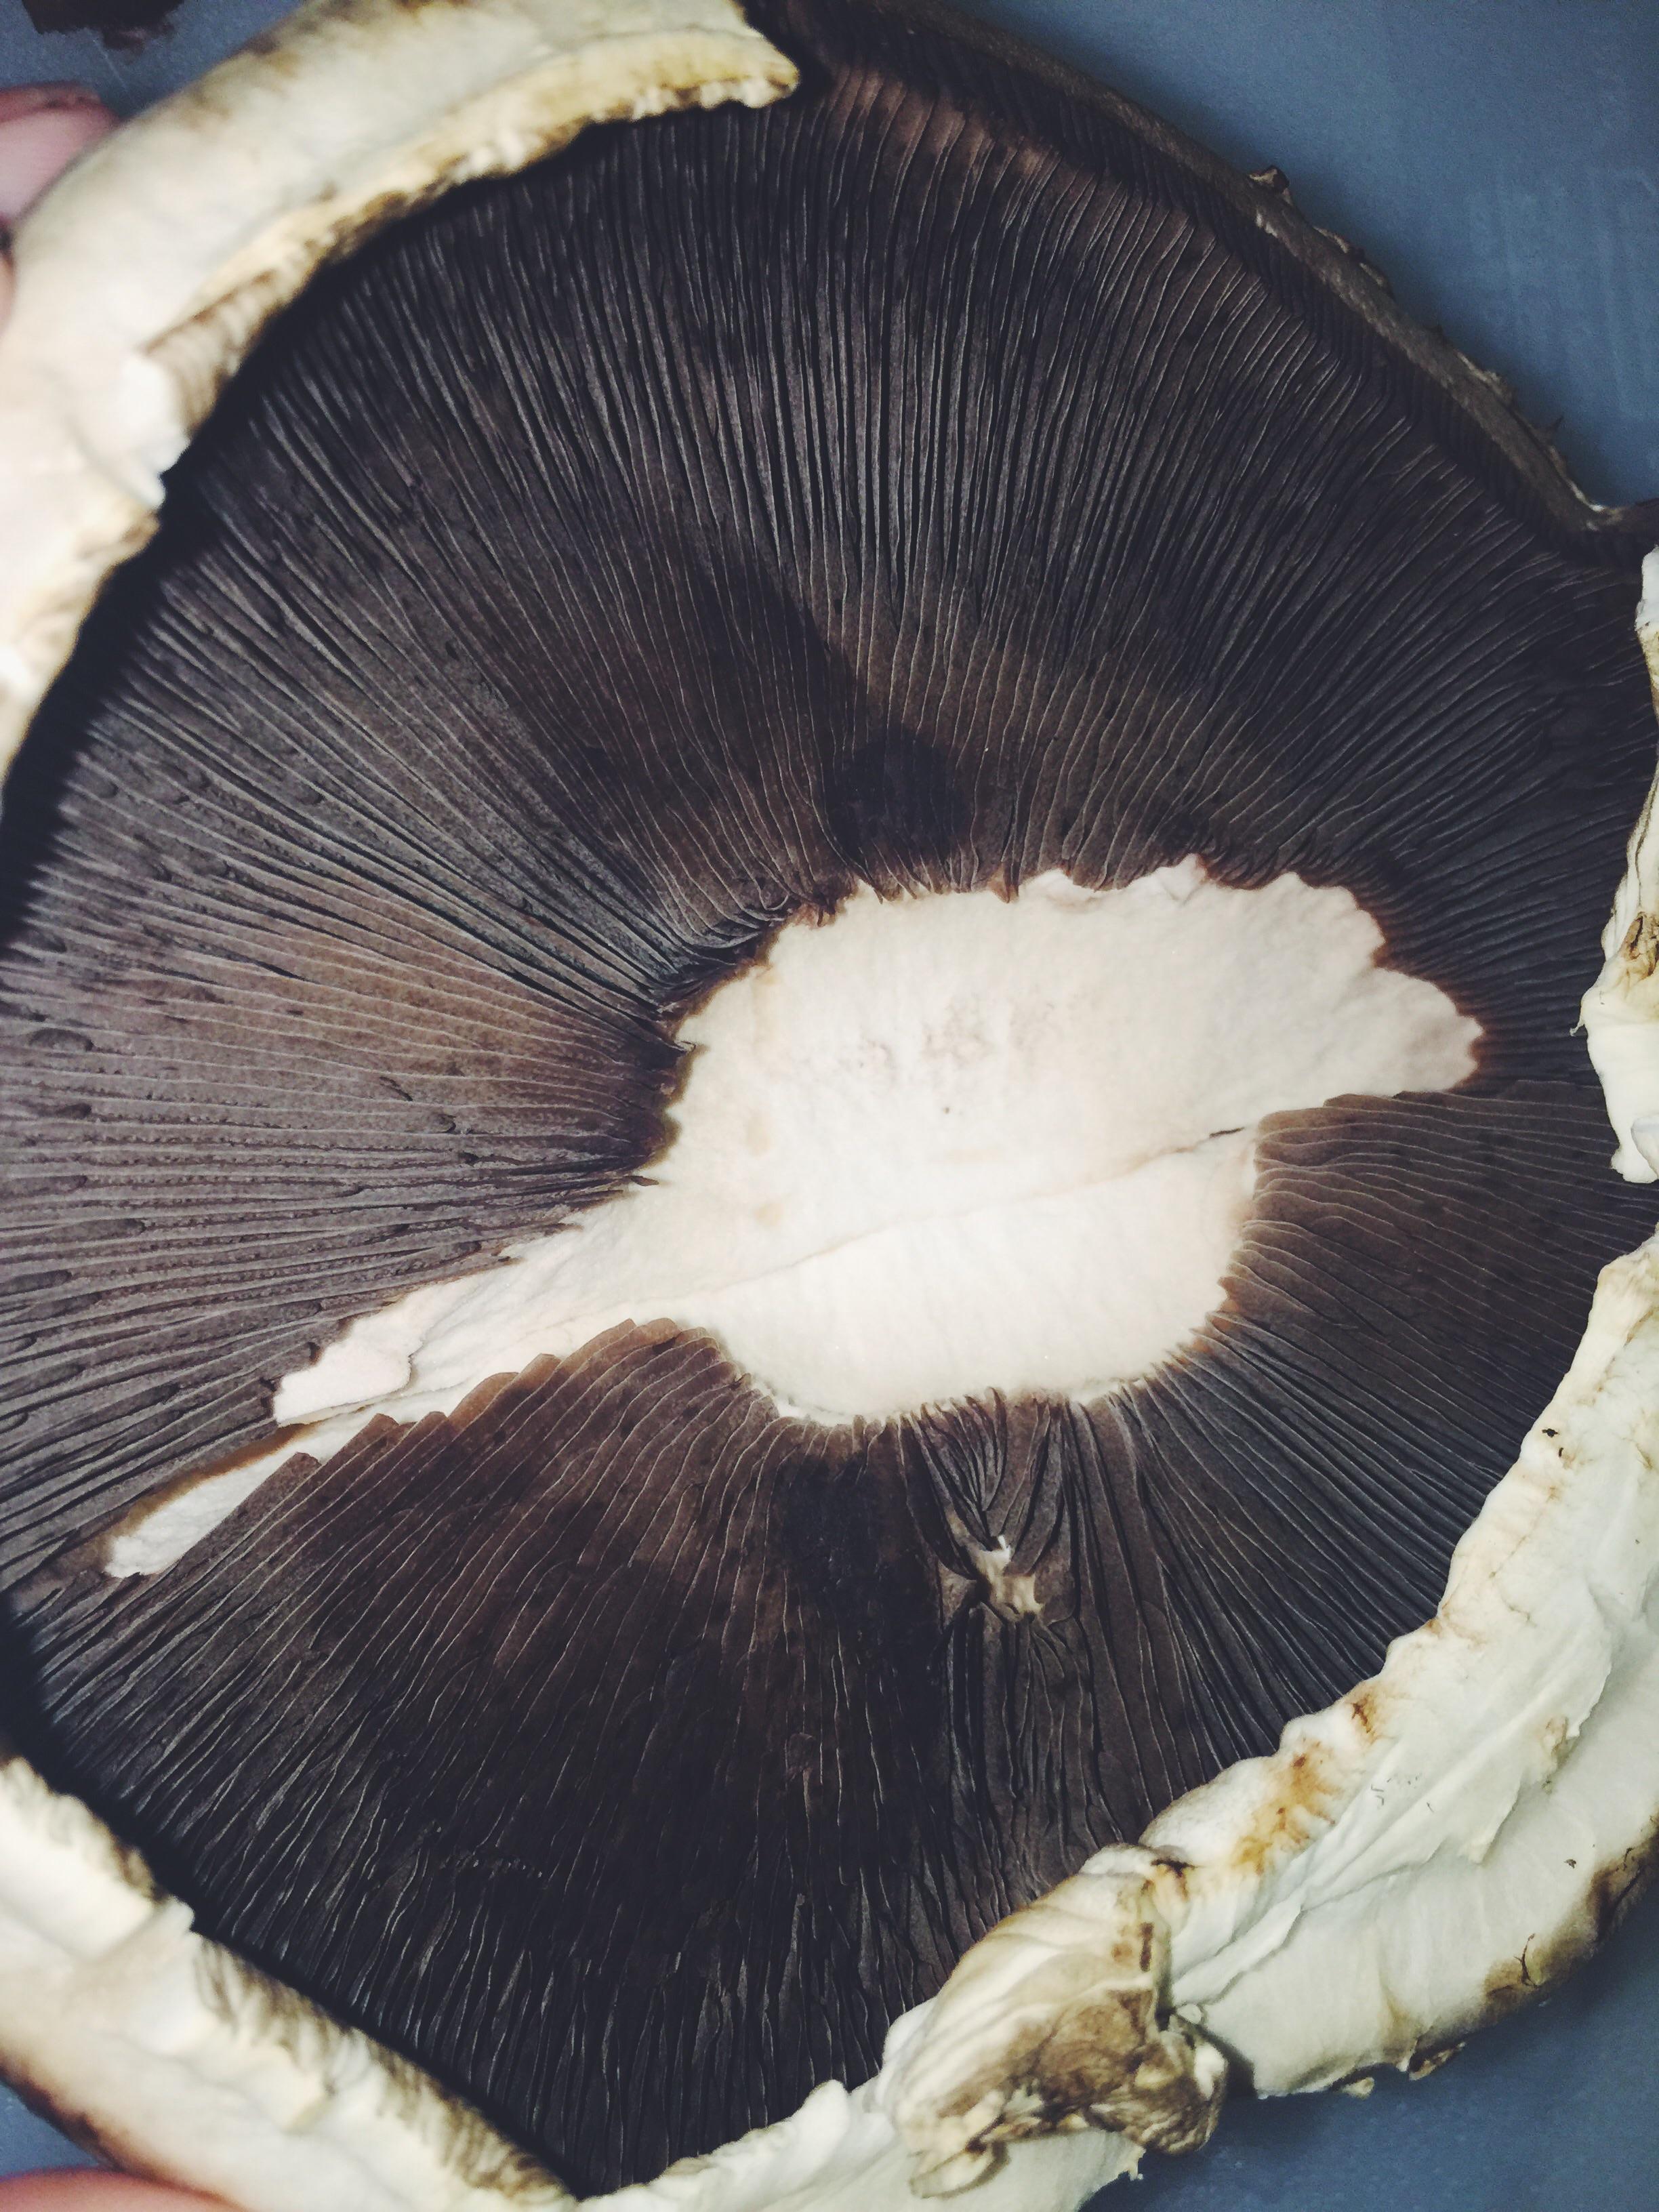 mushroom with gills